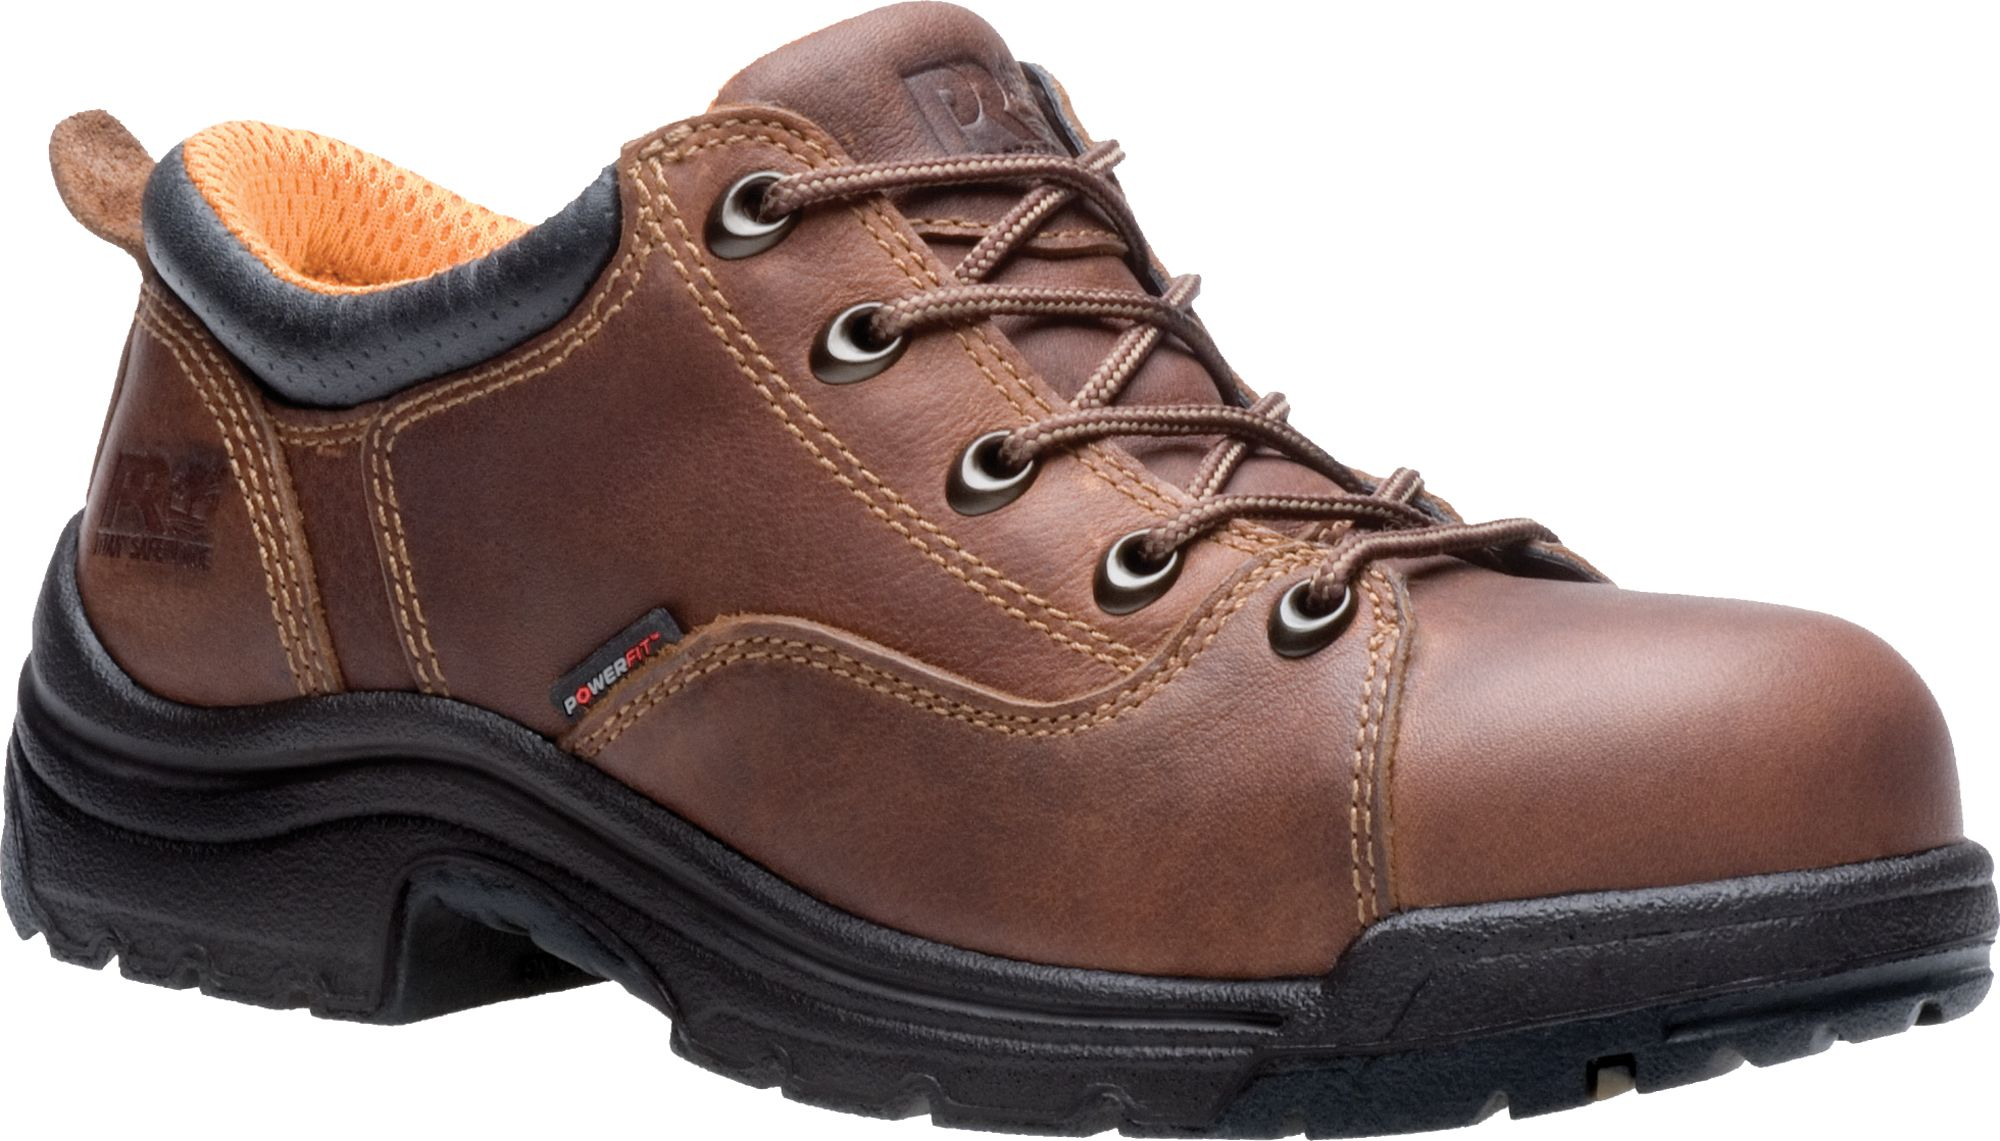 Timberland PRO TITAN® Alloy Safety Toe viYTX